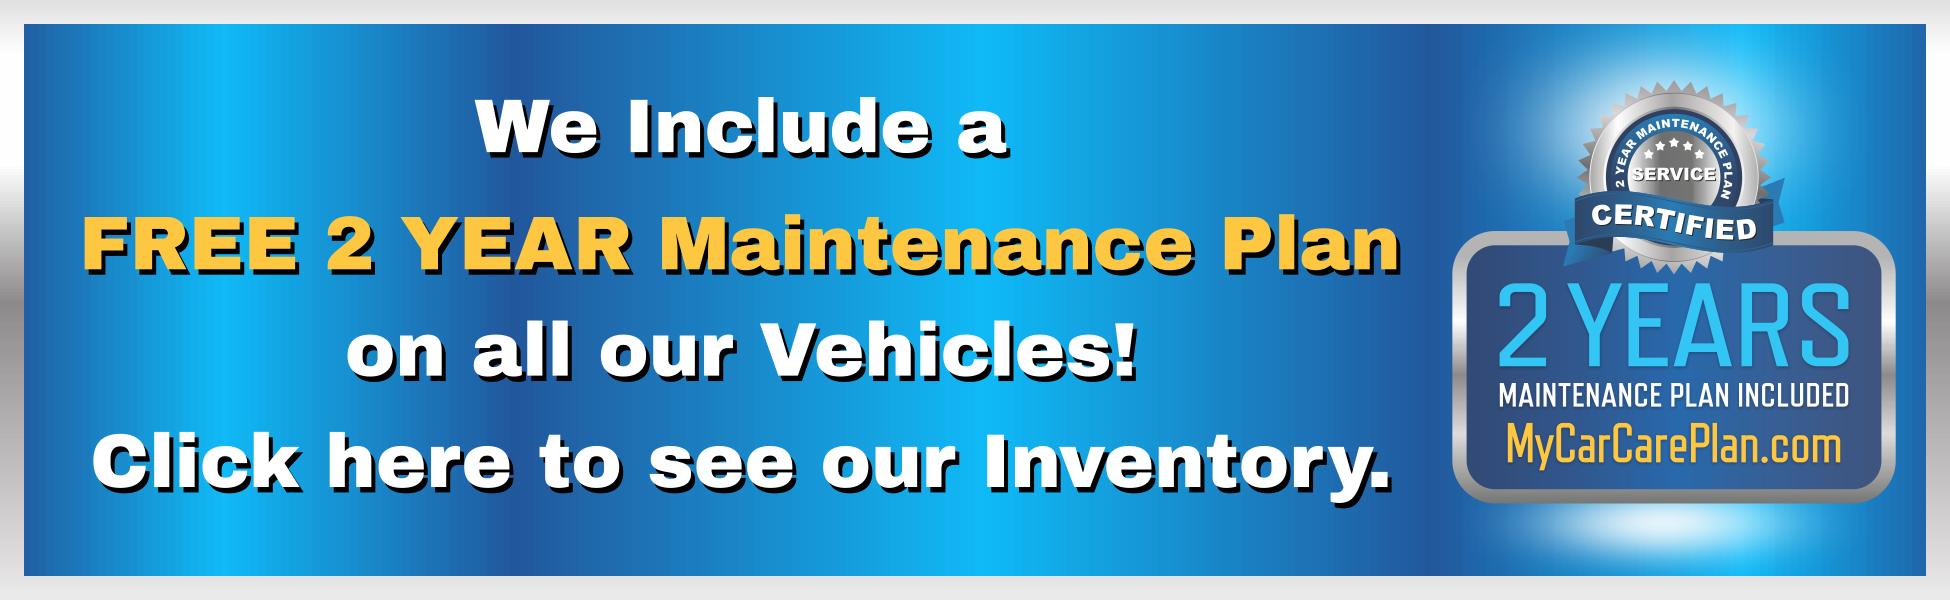 Ranger Motors Austin Inventory - impremedia.net